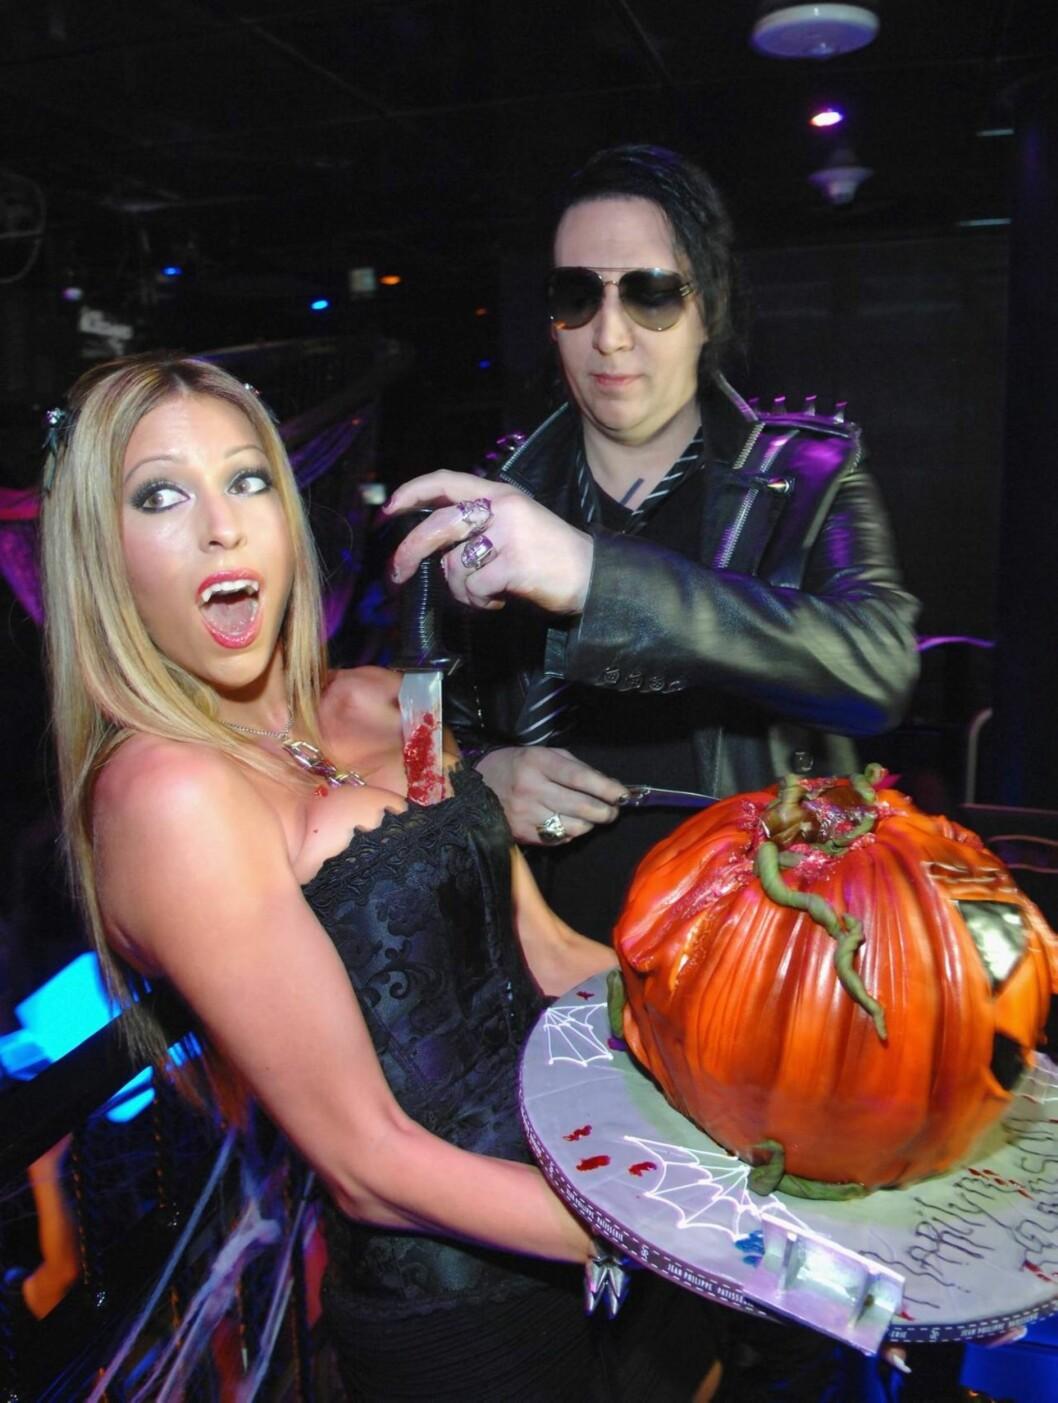 KOM SOM SEG SELV: Marilyn Manson hadde kledd seg ut som... nei, vent. Manson kom som seg selv på halloweenfest i Las Vegas. Foto: All Over Press